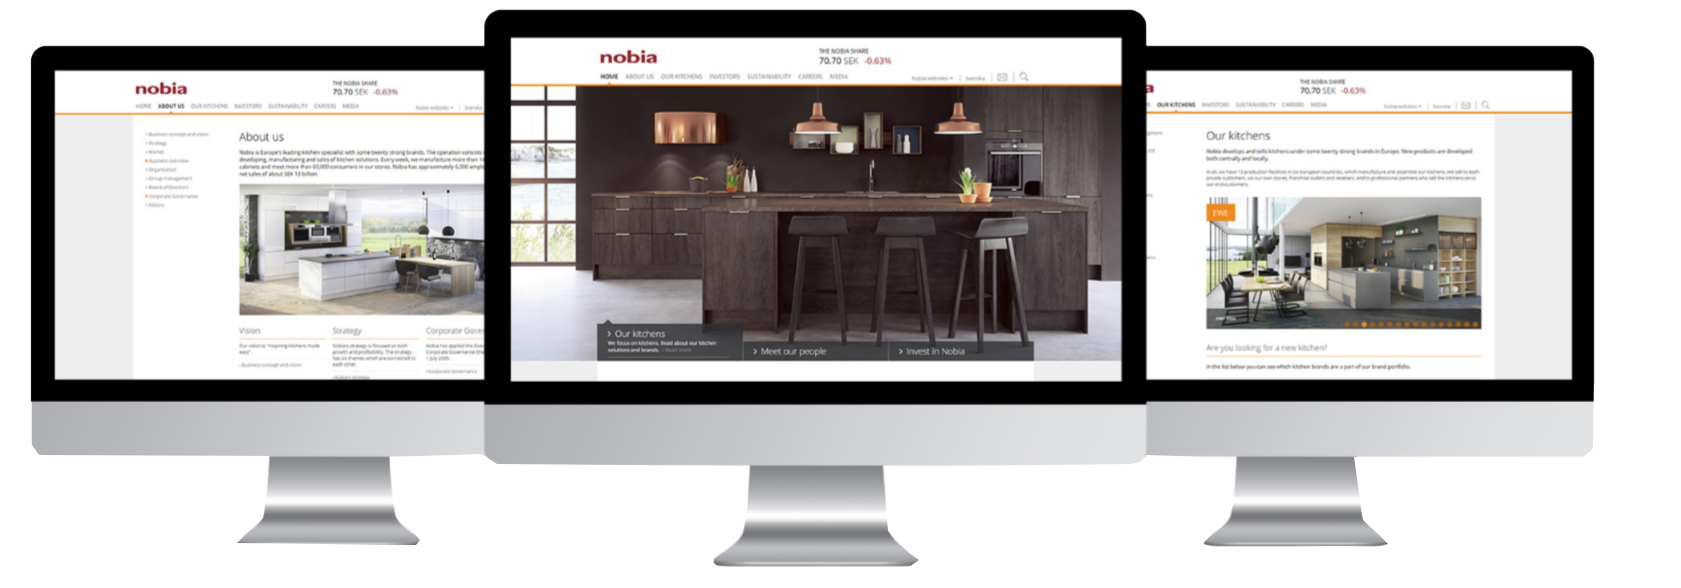 Nobia UK - Totara Learn Site - LMS Case Study